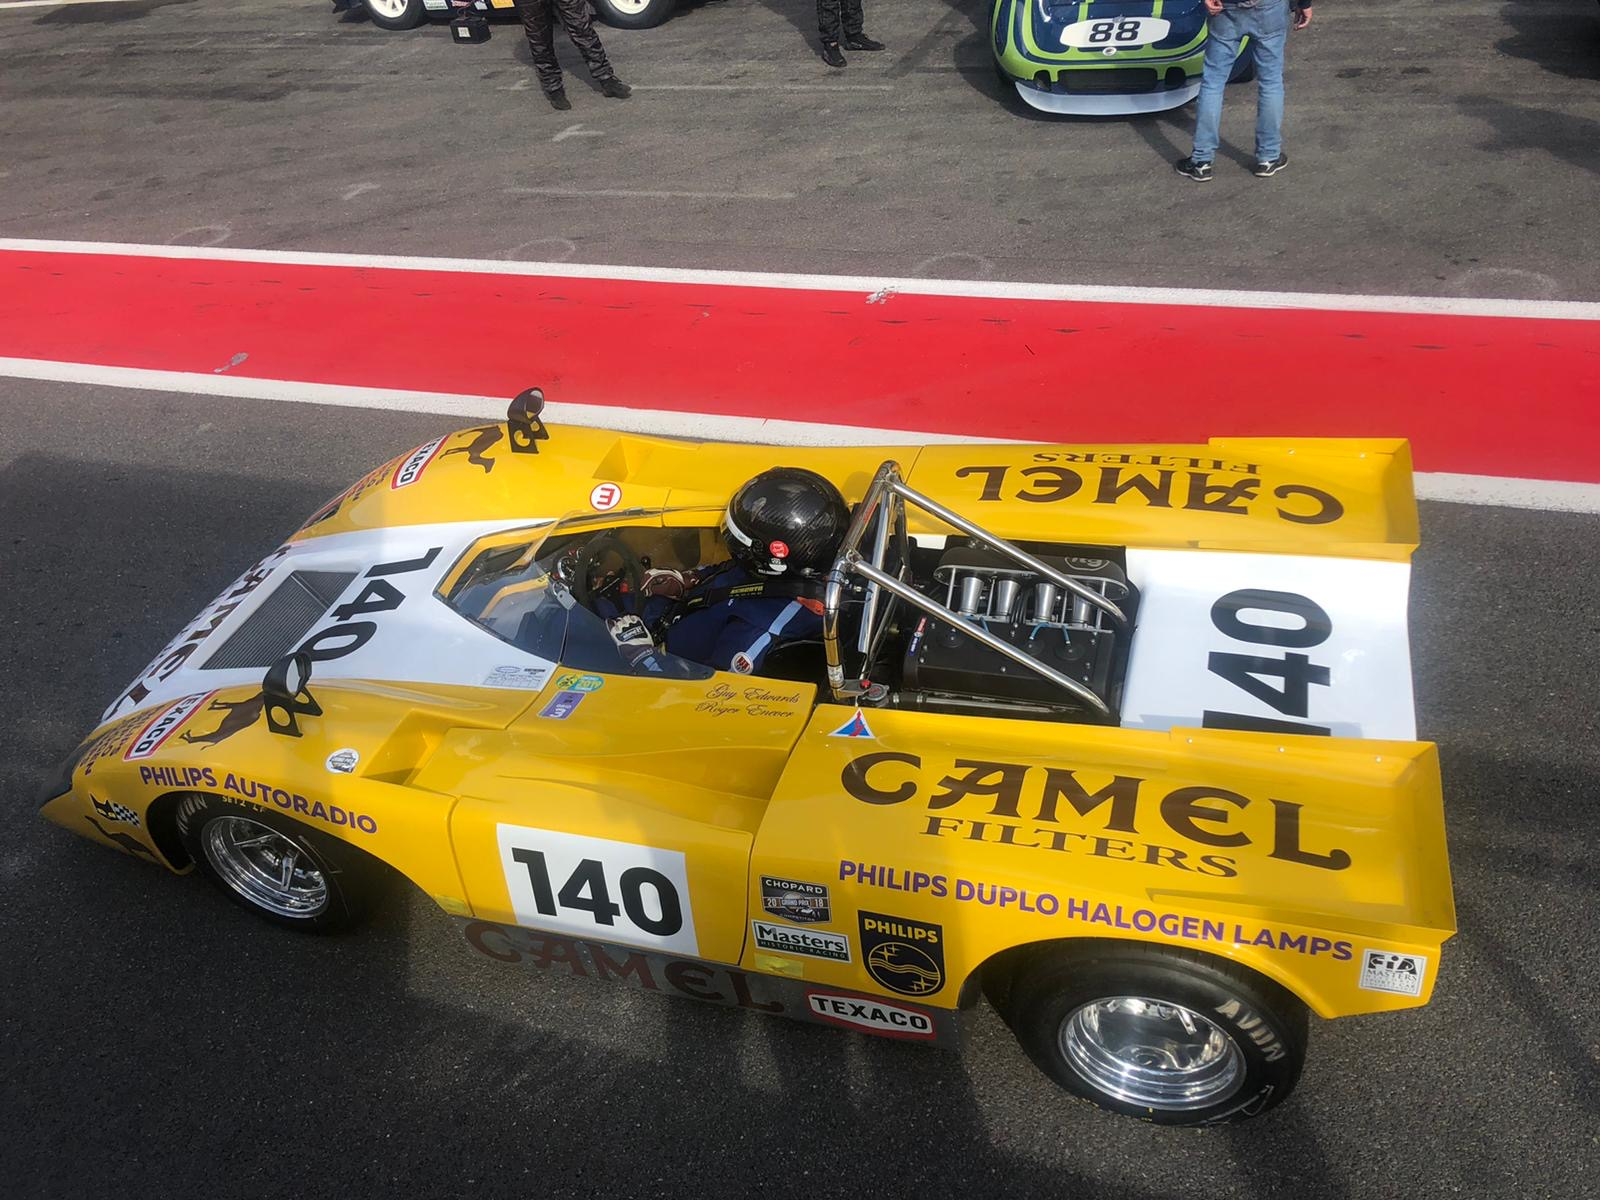 Lola T212 Spa 6 Hours 2019